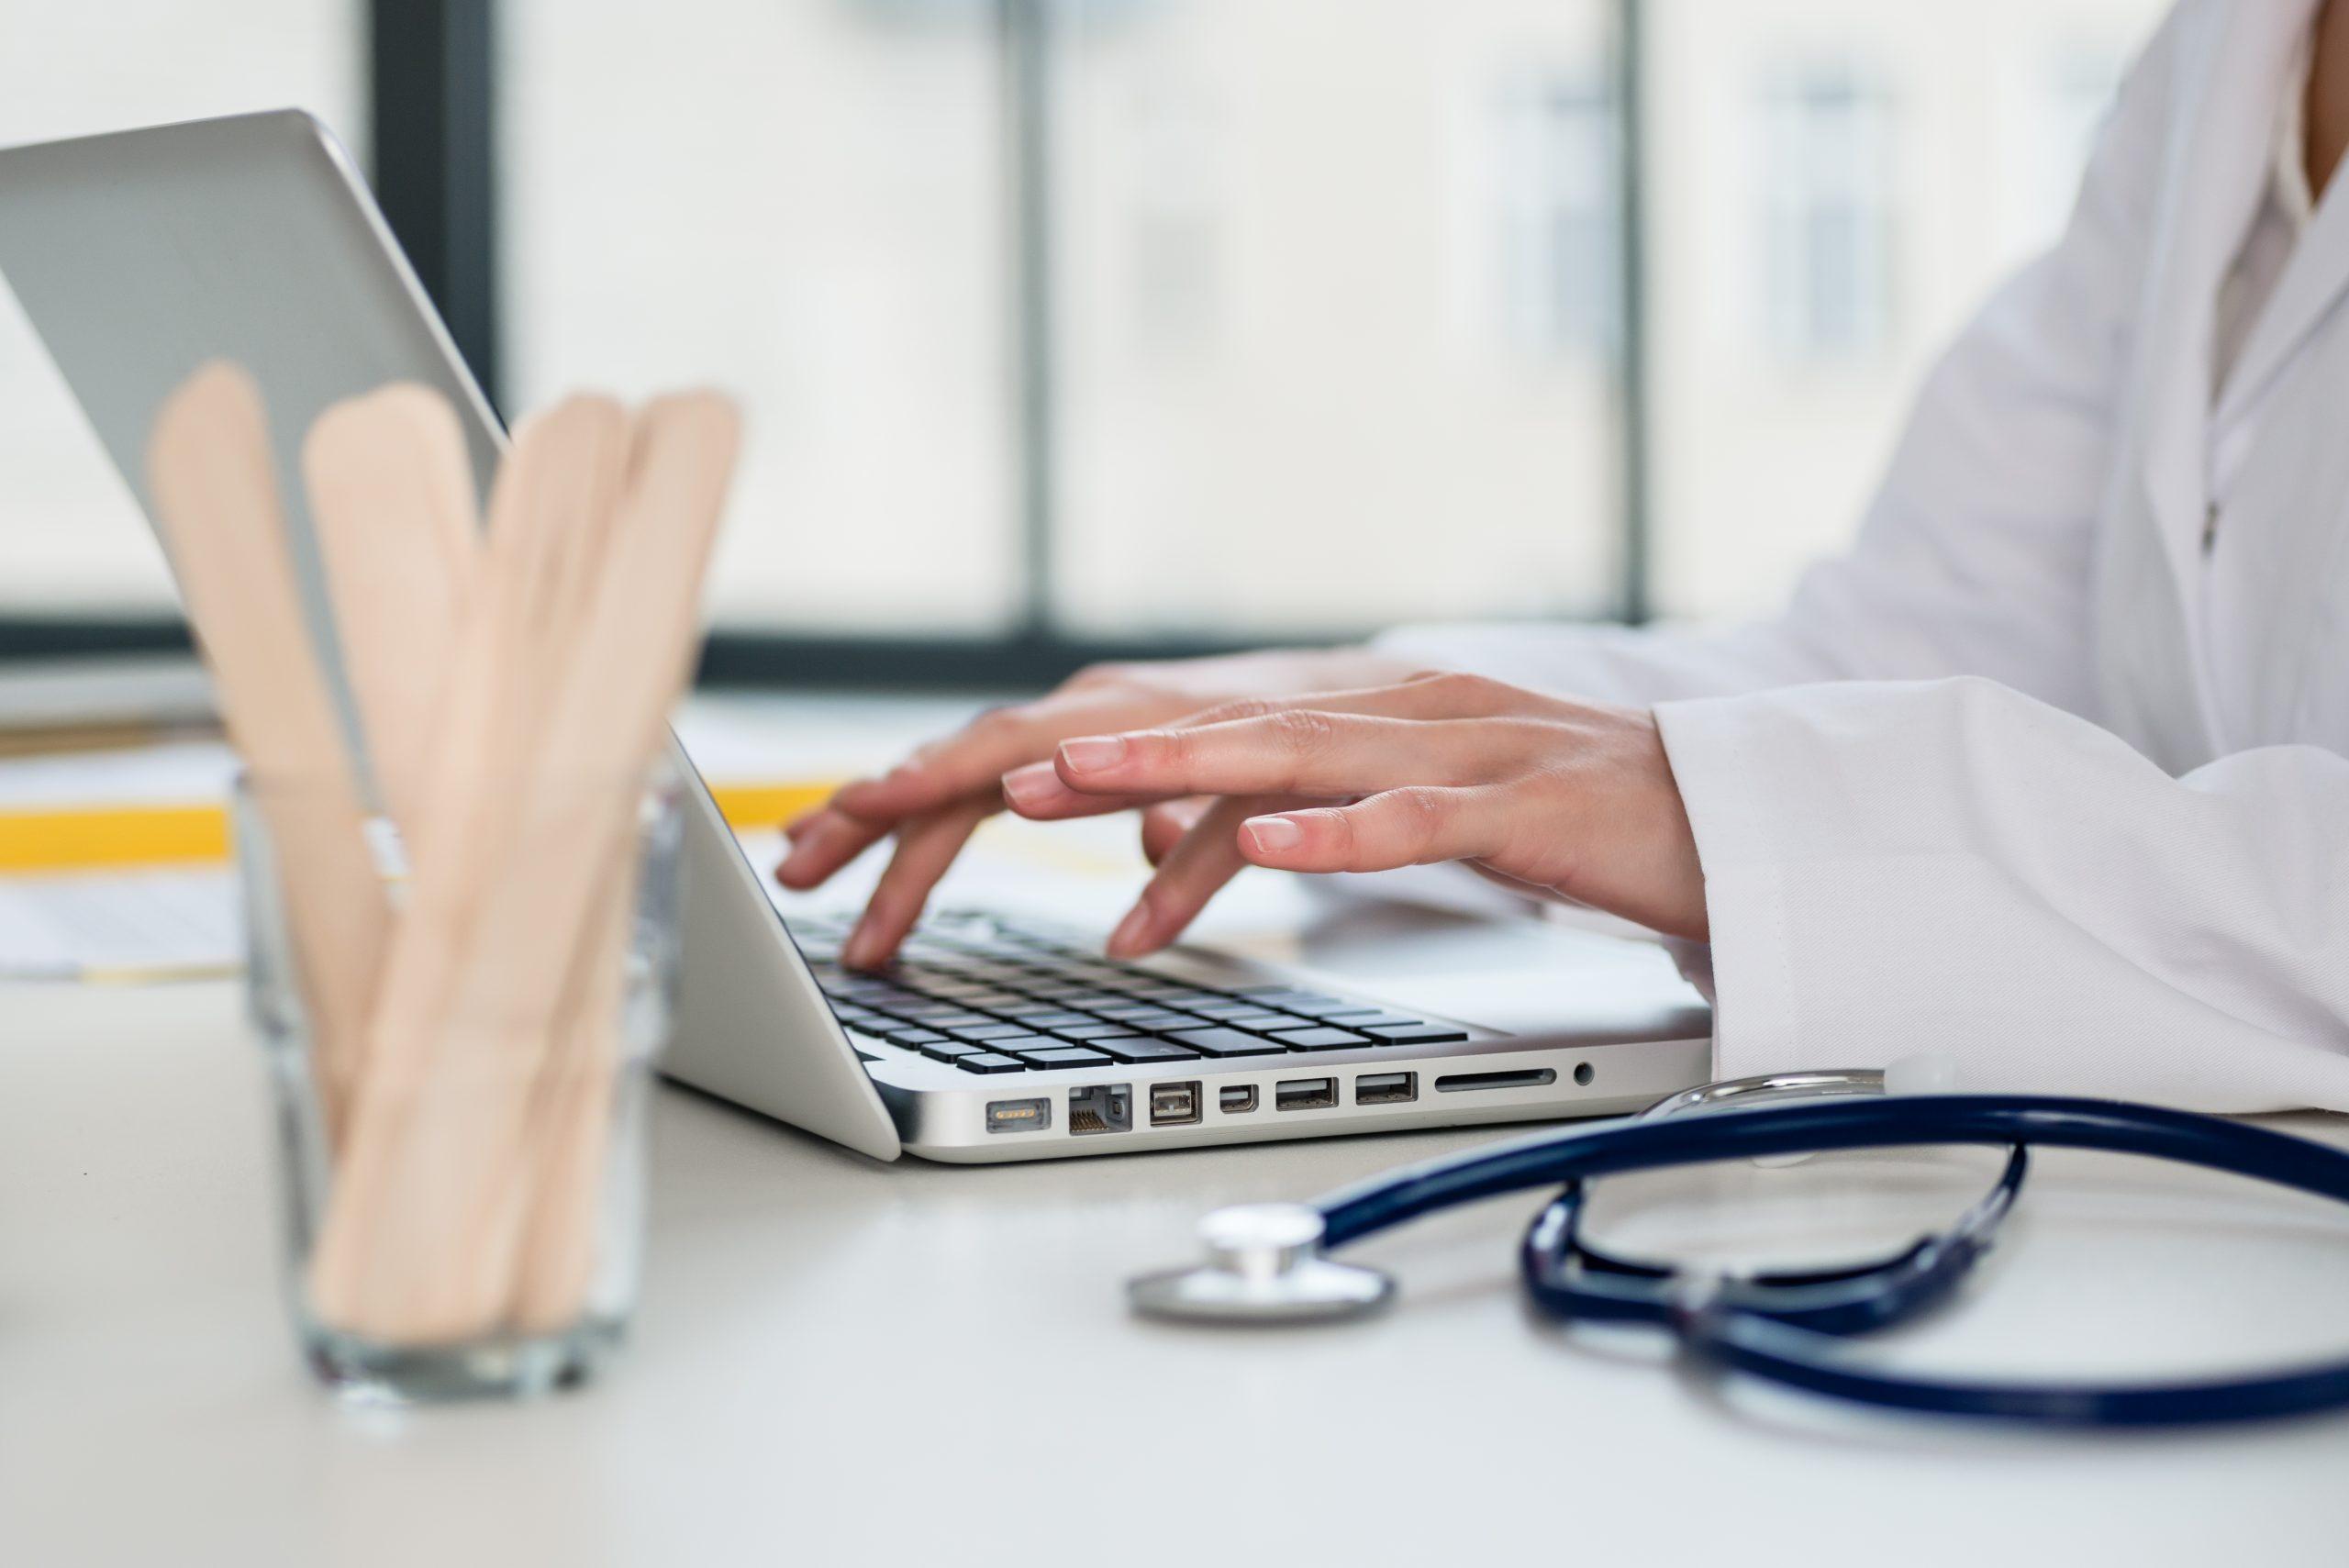 medic la laptop